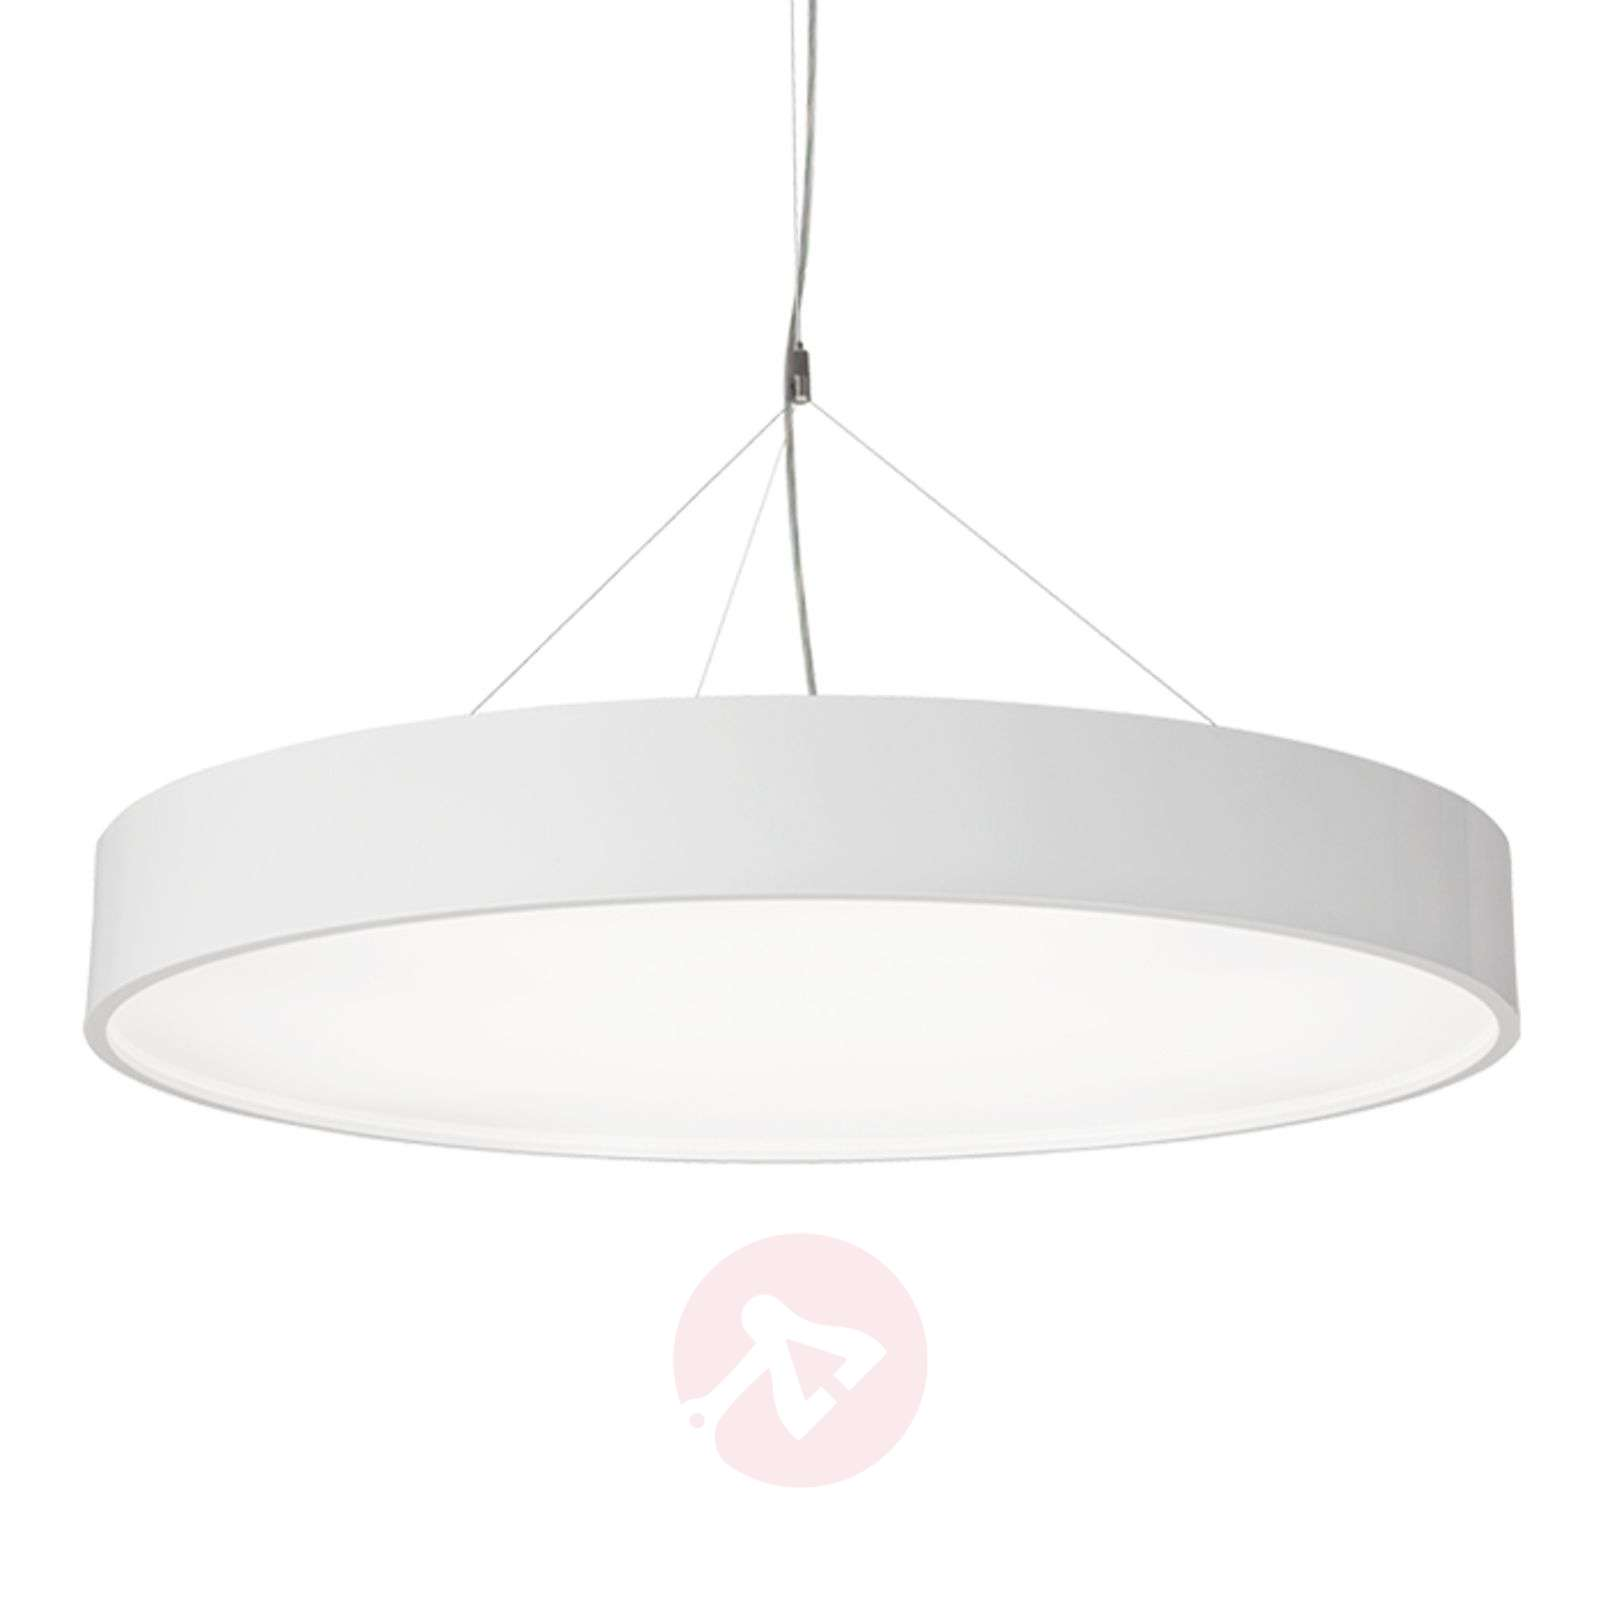 Large LED hanging light Module P945 Round White-6040191-01